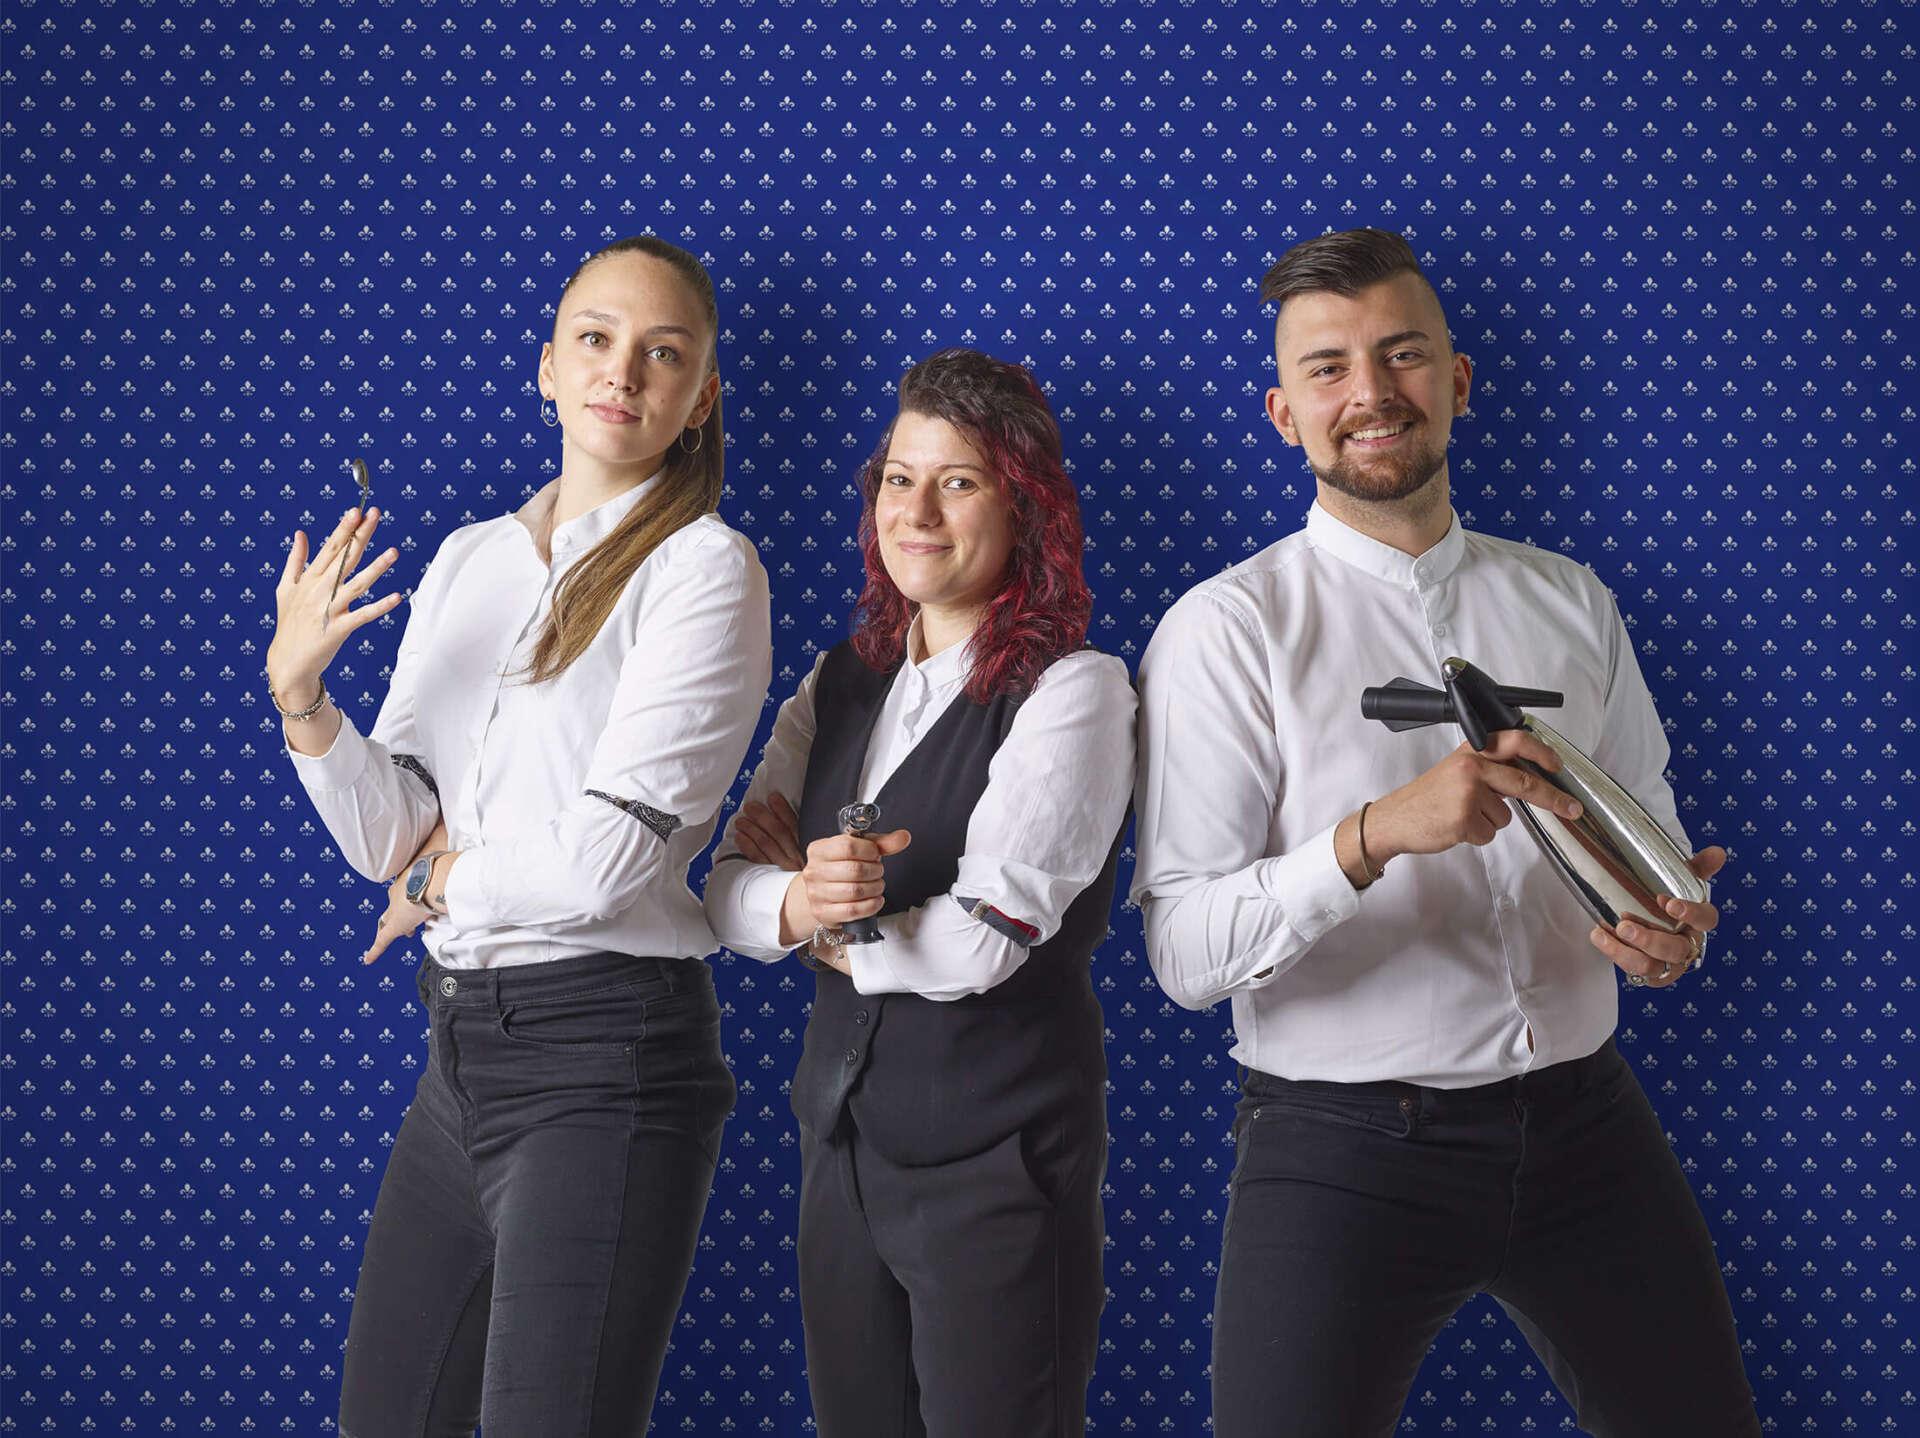 Veronica Costantino, Giulia Colantoni e Andrey Nabokov - Largo9